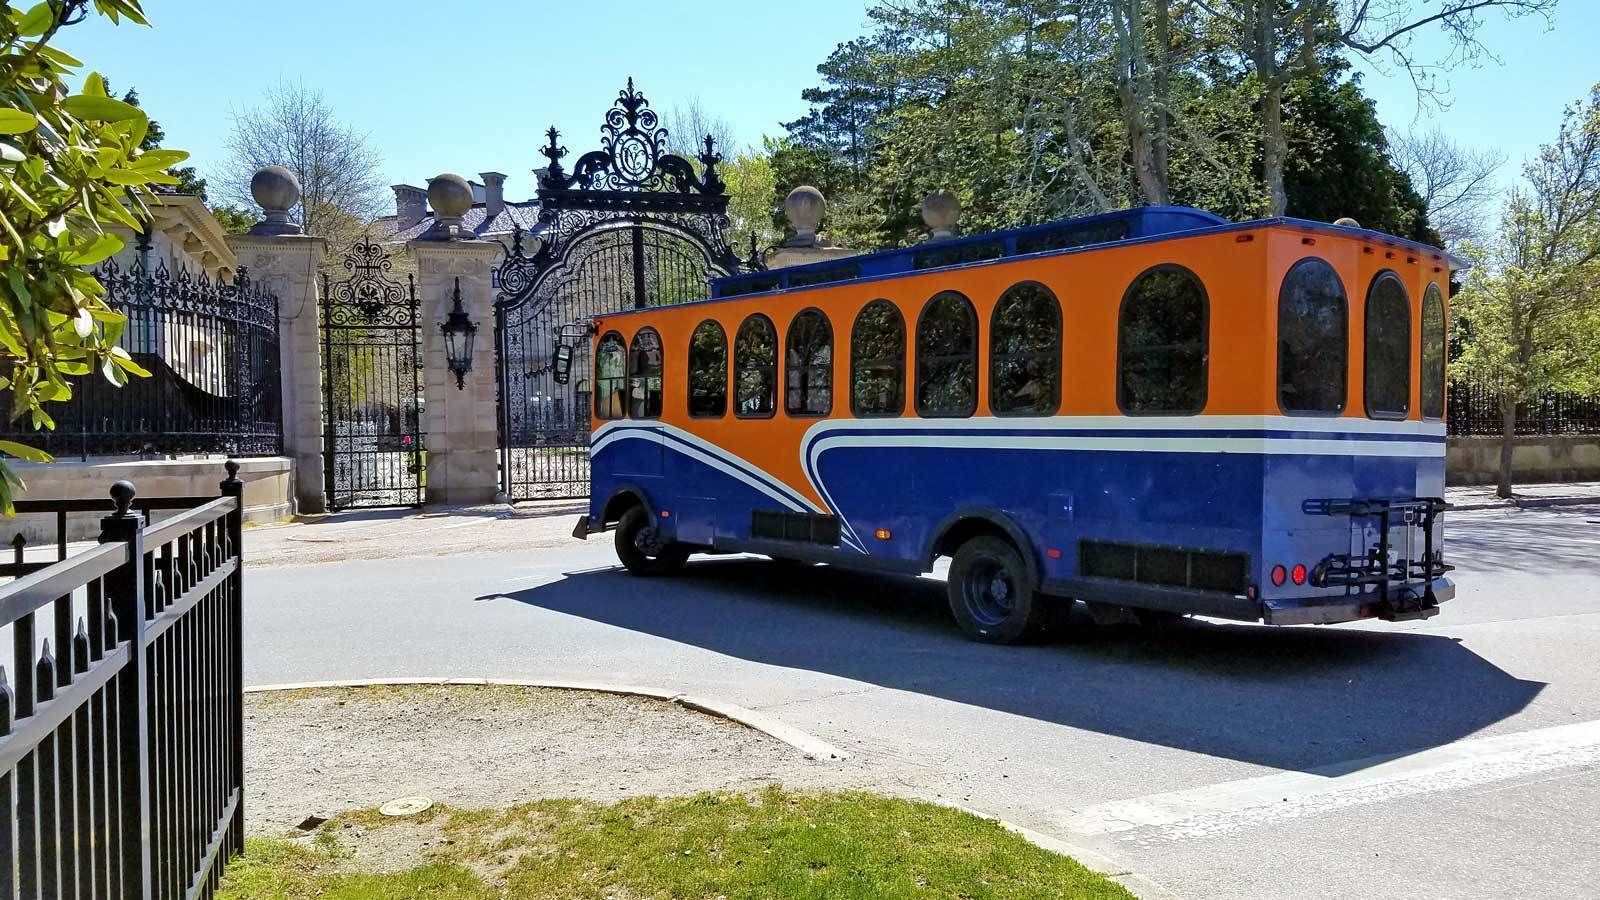 bus trolley entering a fenced gate in Newport